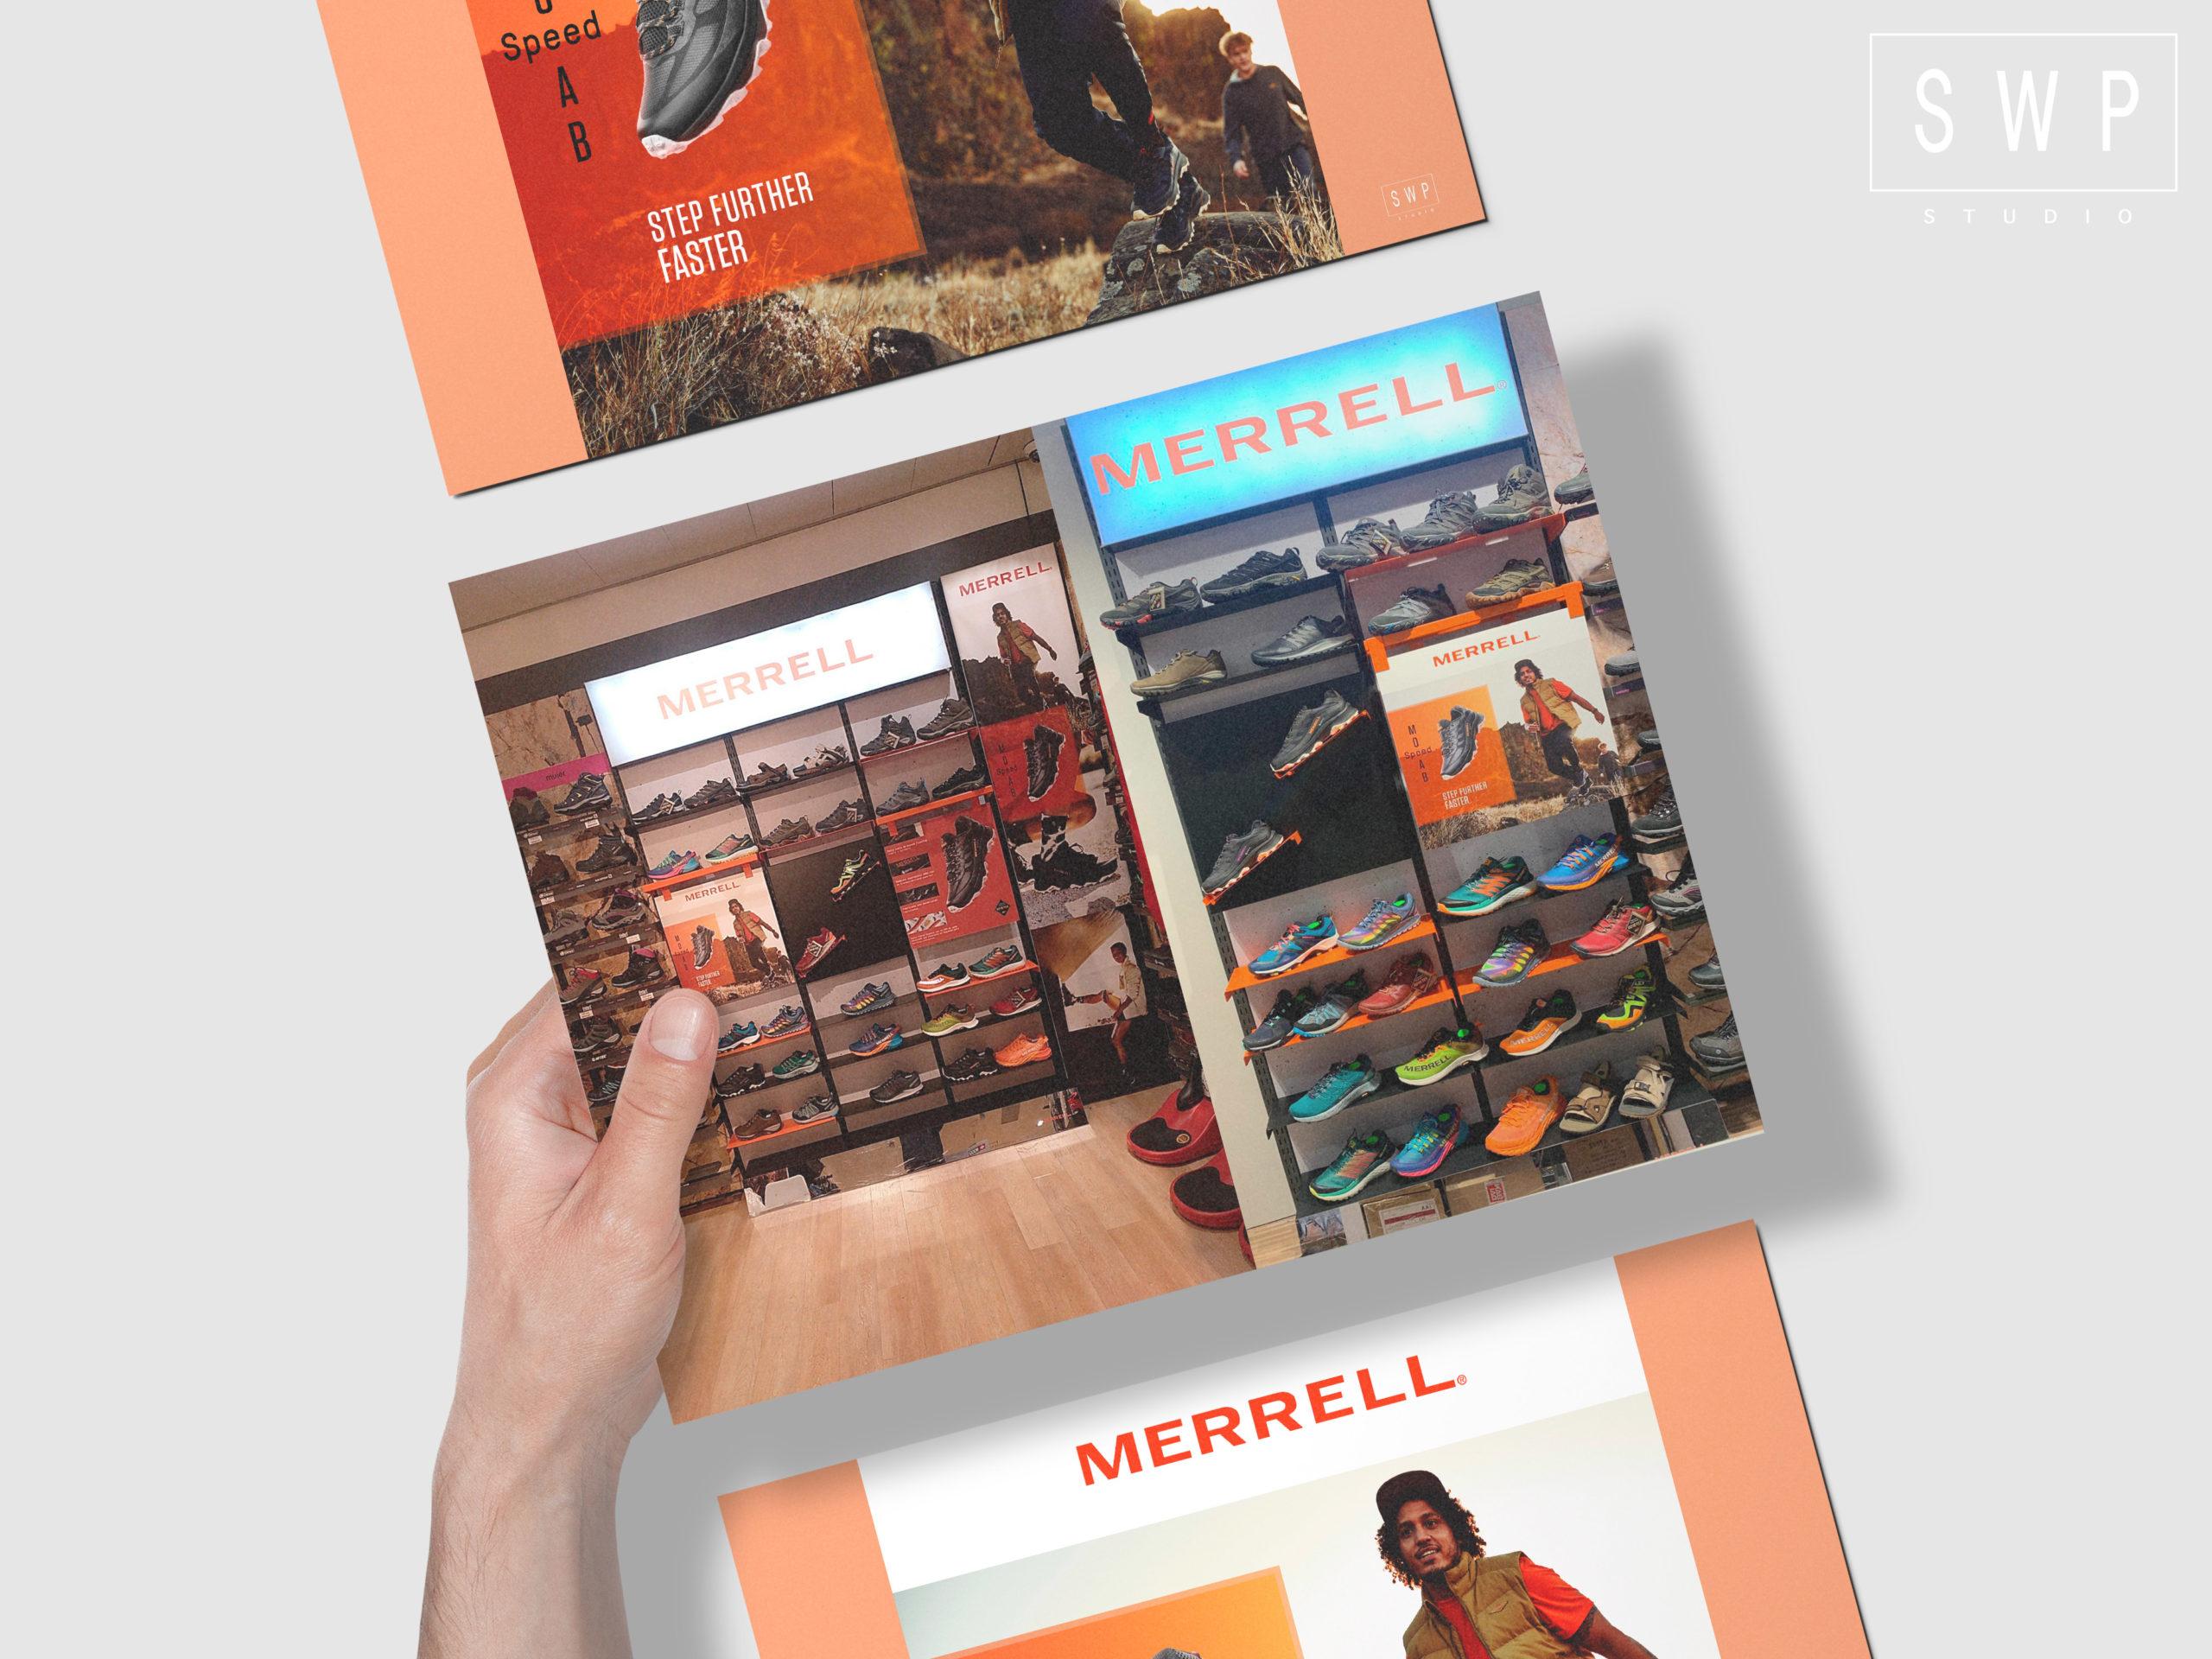 producto-swp-merrell2